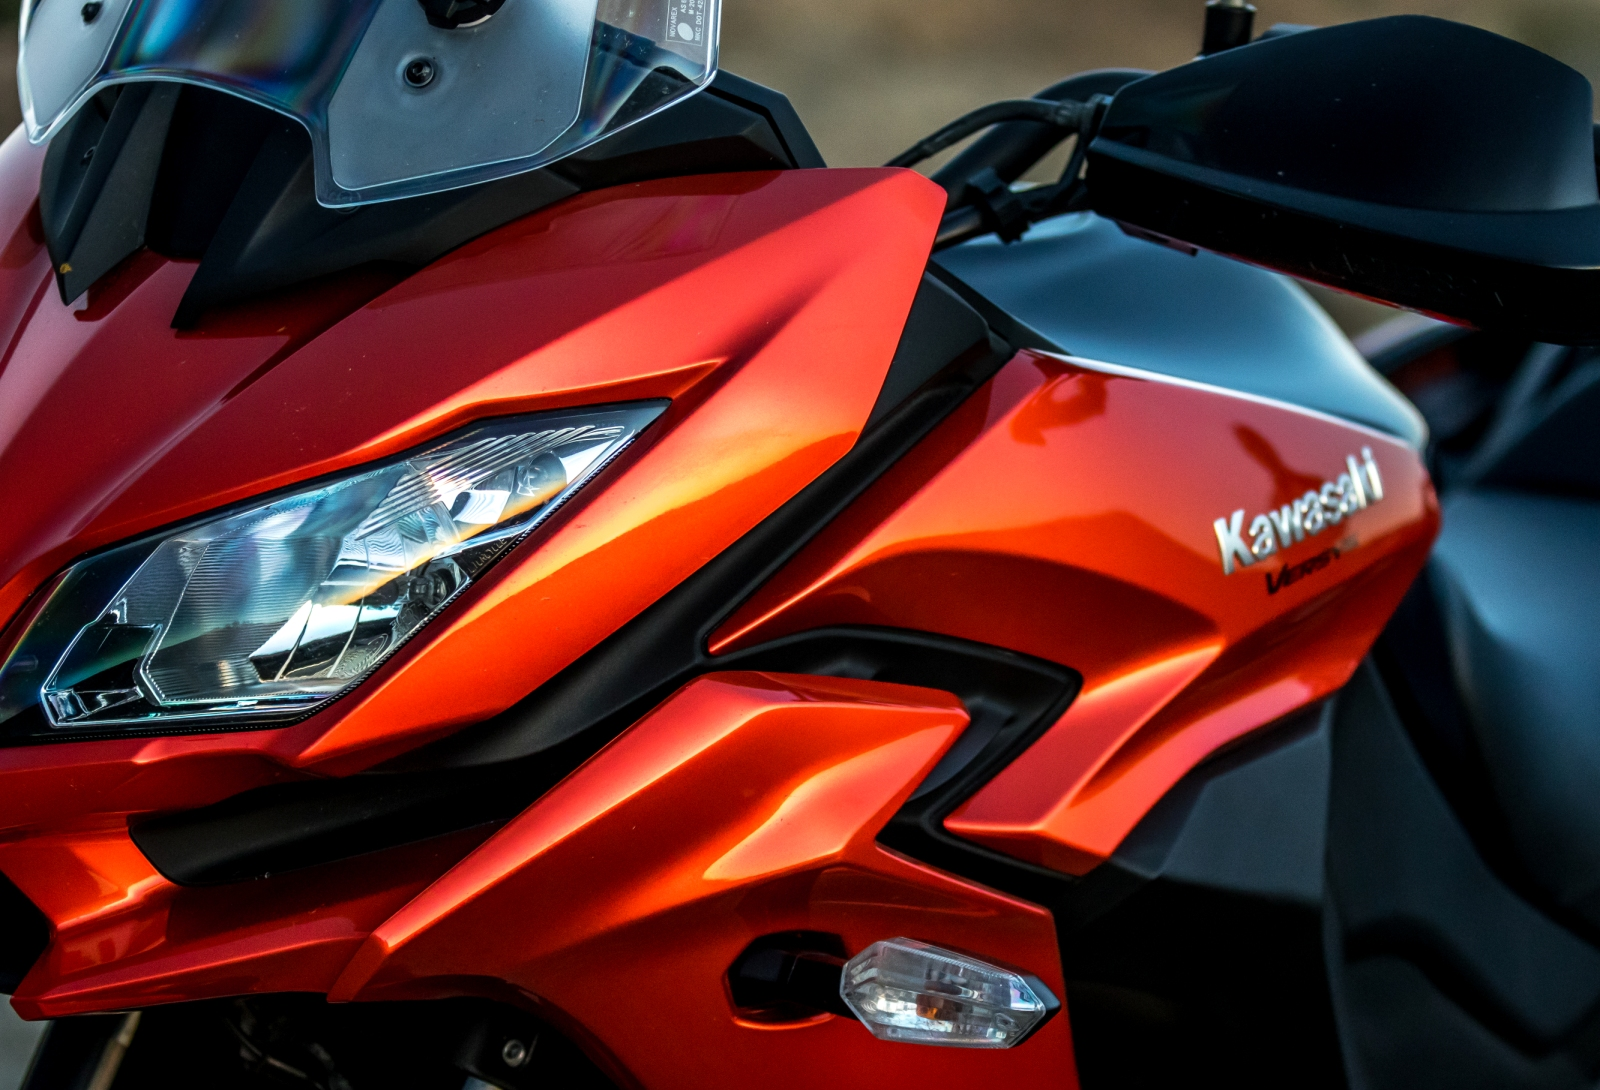 orange 2015 kawasaki versys 1000 lt review  at mifinder.co